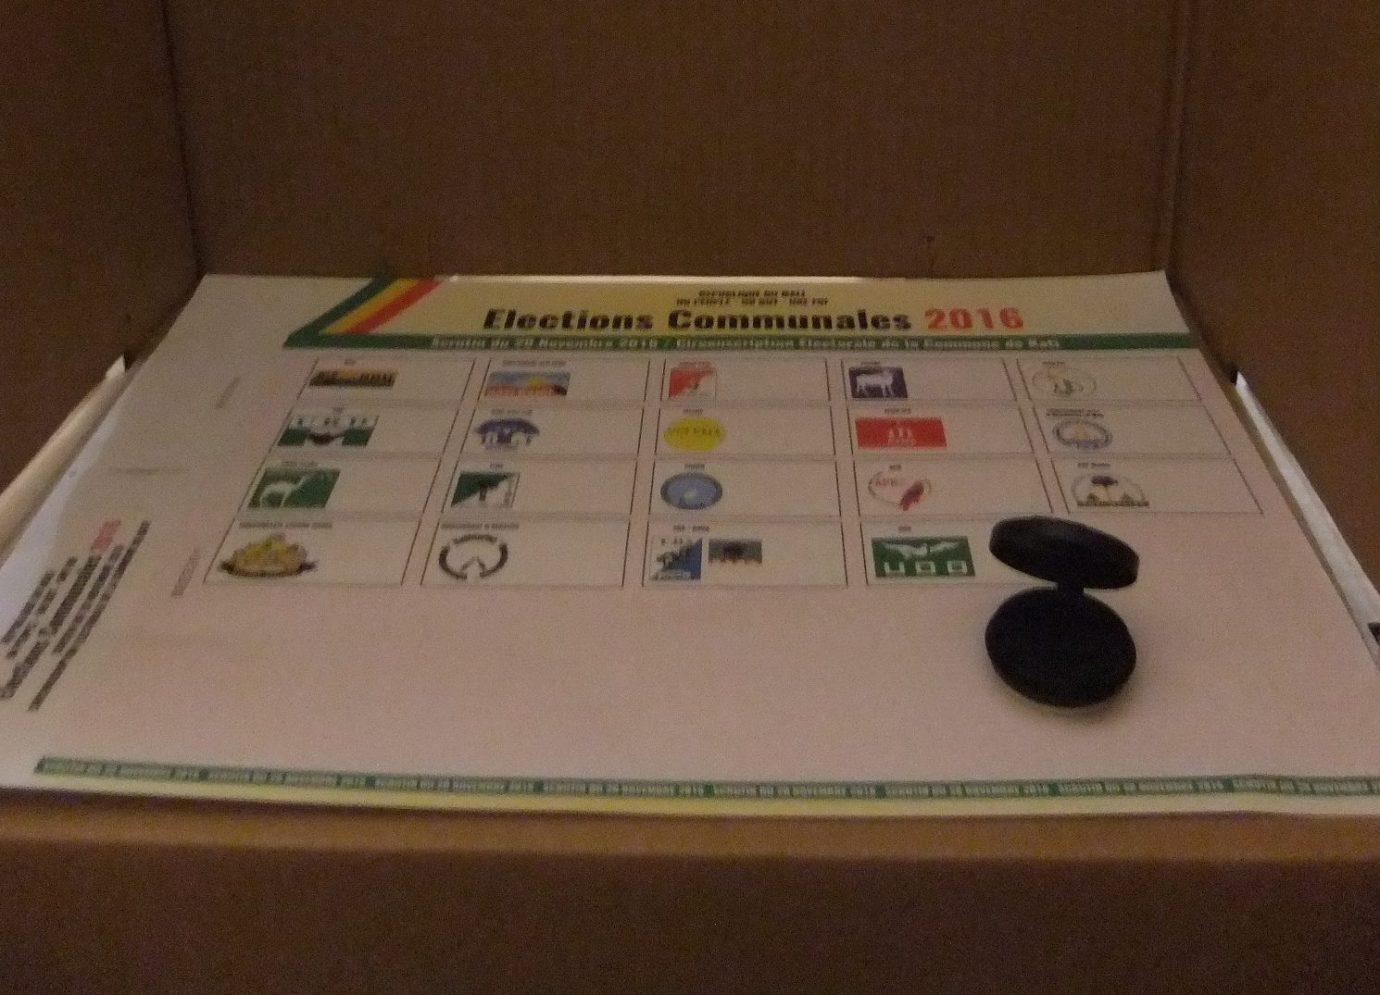 Dans une cabine de vote à Kati - In einer Wahlkabine in Kati am 20.11.2016